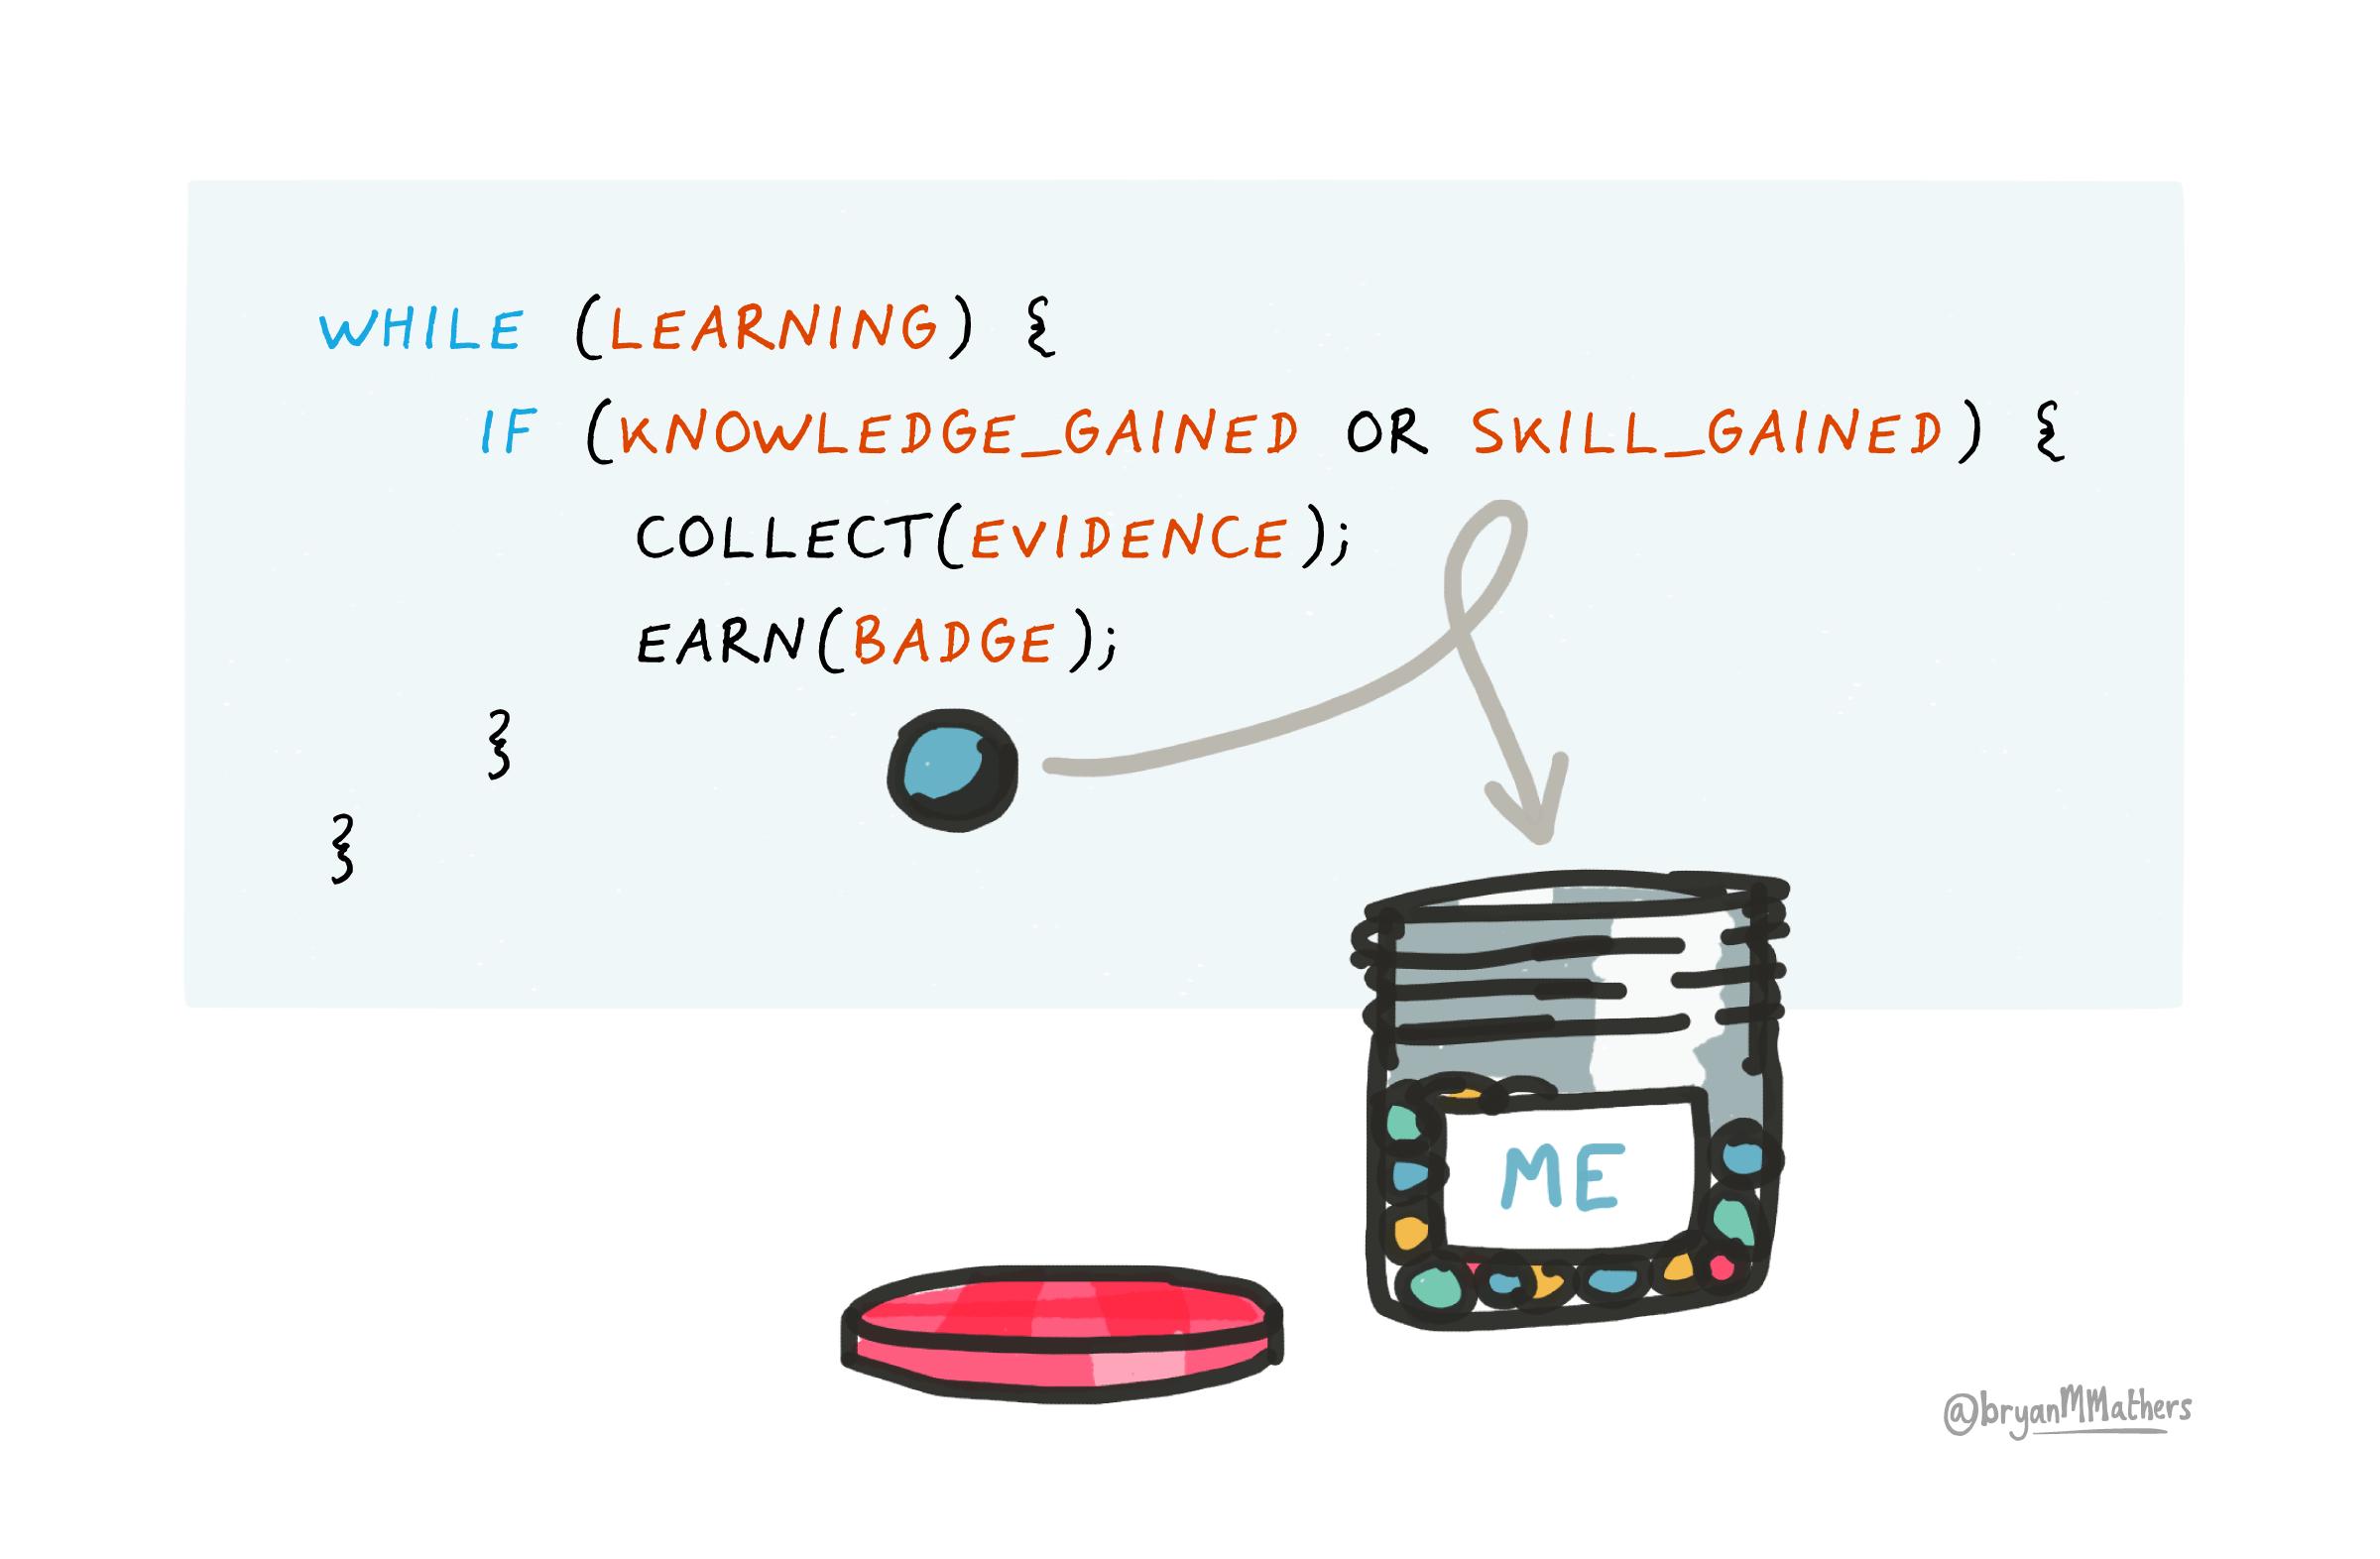 Computing Badges